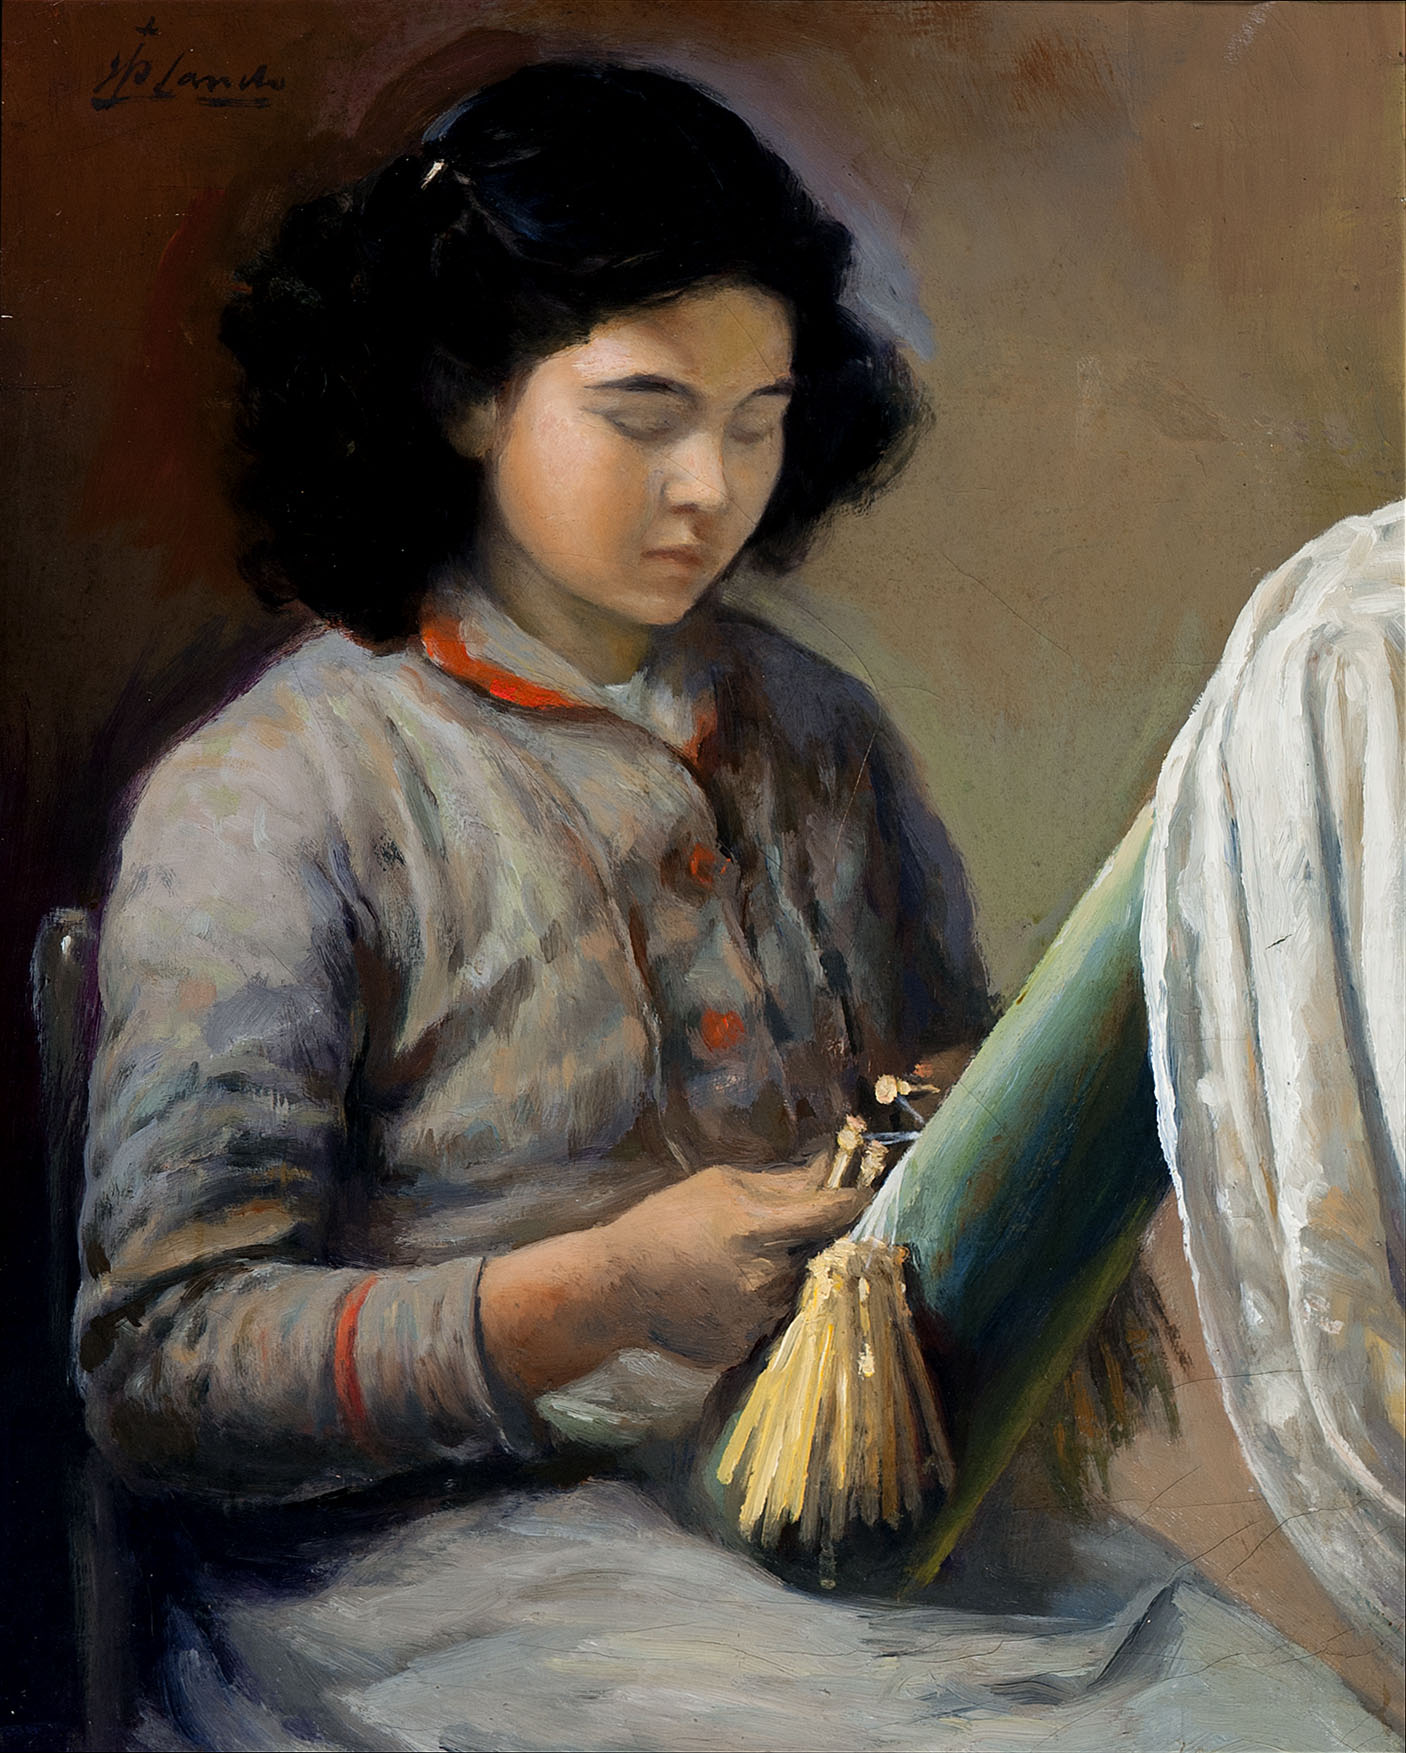 Fent punta de coixí | Sancho Piqué, Josep